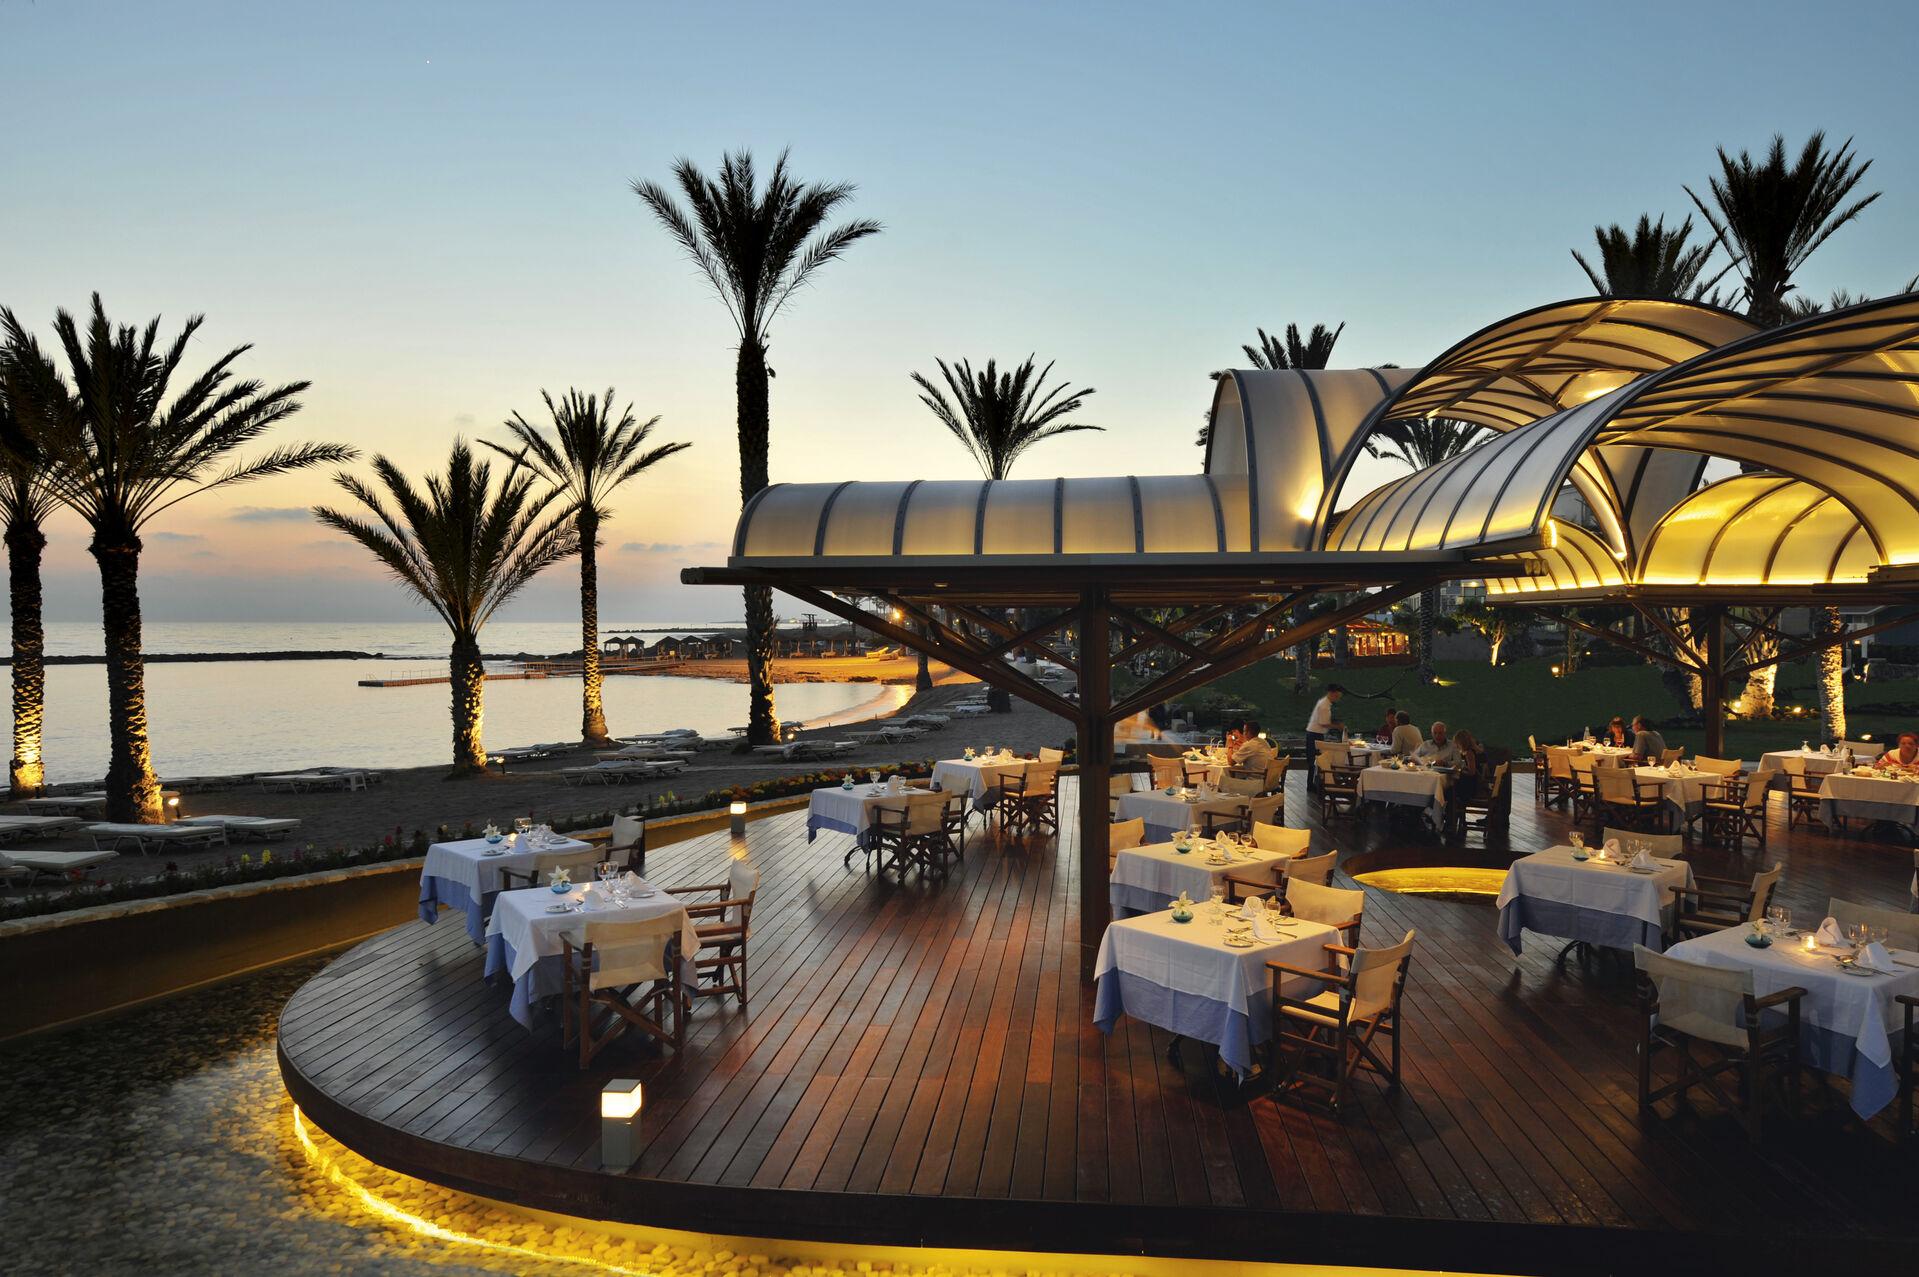 https://cms.satur.sk/data/imgs/tour_image/orig/08-pioneer-beach-hotel-thalassa-mediterranean-rest-1972635.jpg